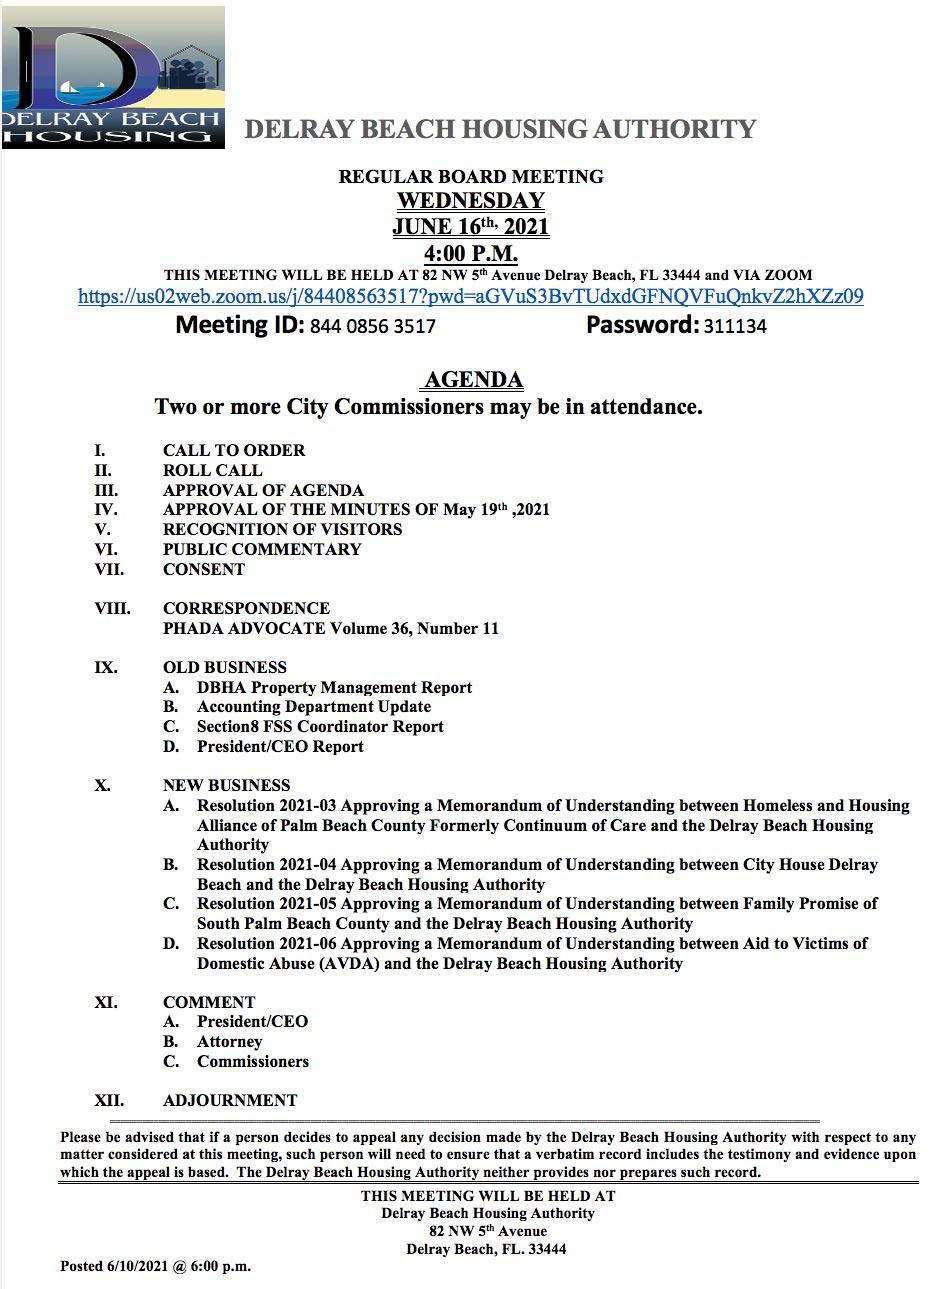 Agenda - Board Meeting - Jun 16th, 2021